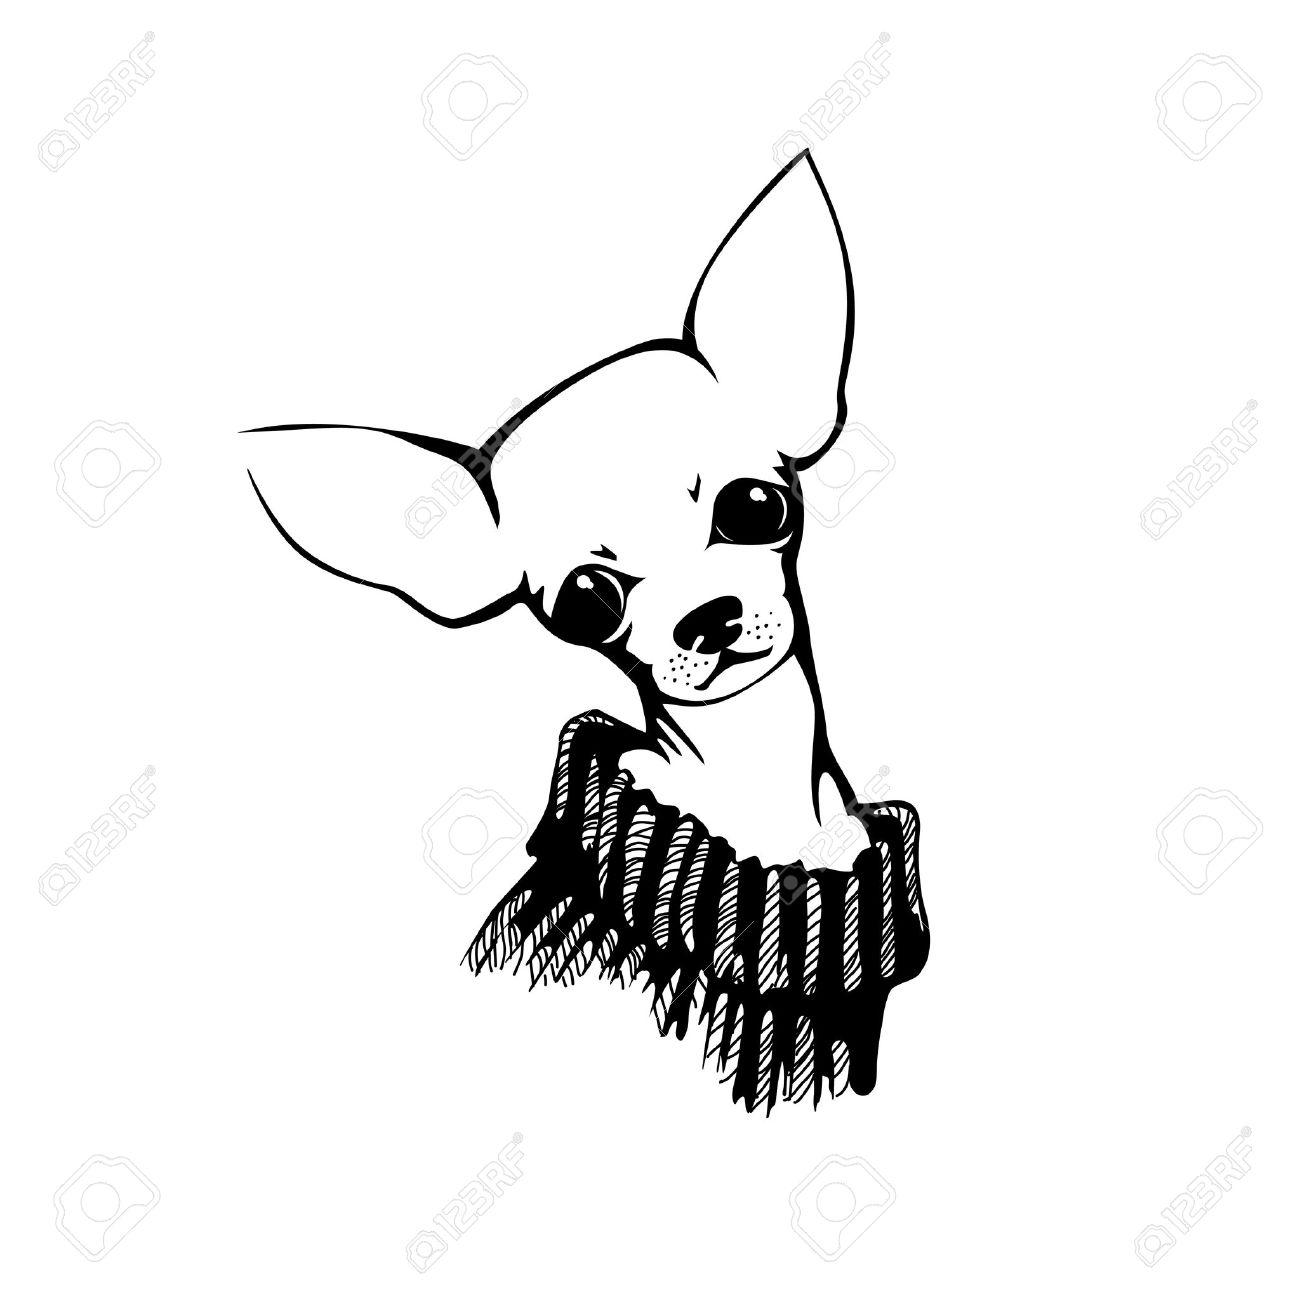 1300x1300 Drawn Chihuahua Black And White